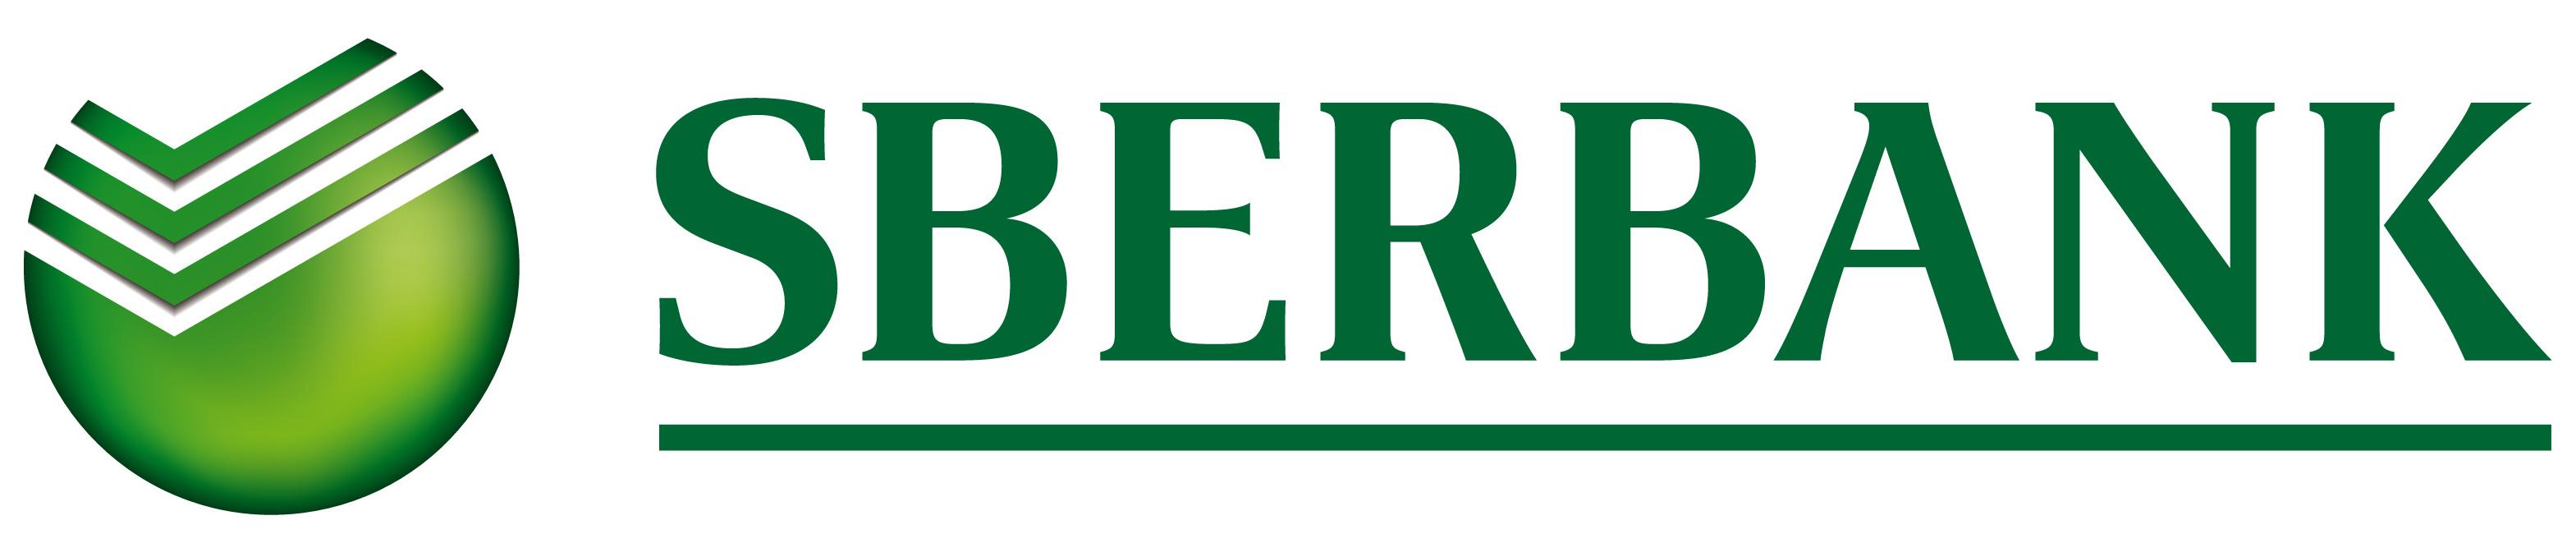 Sberbank 20logo